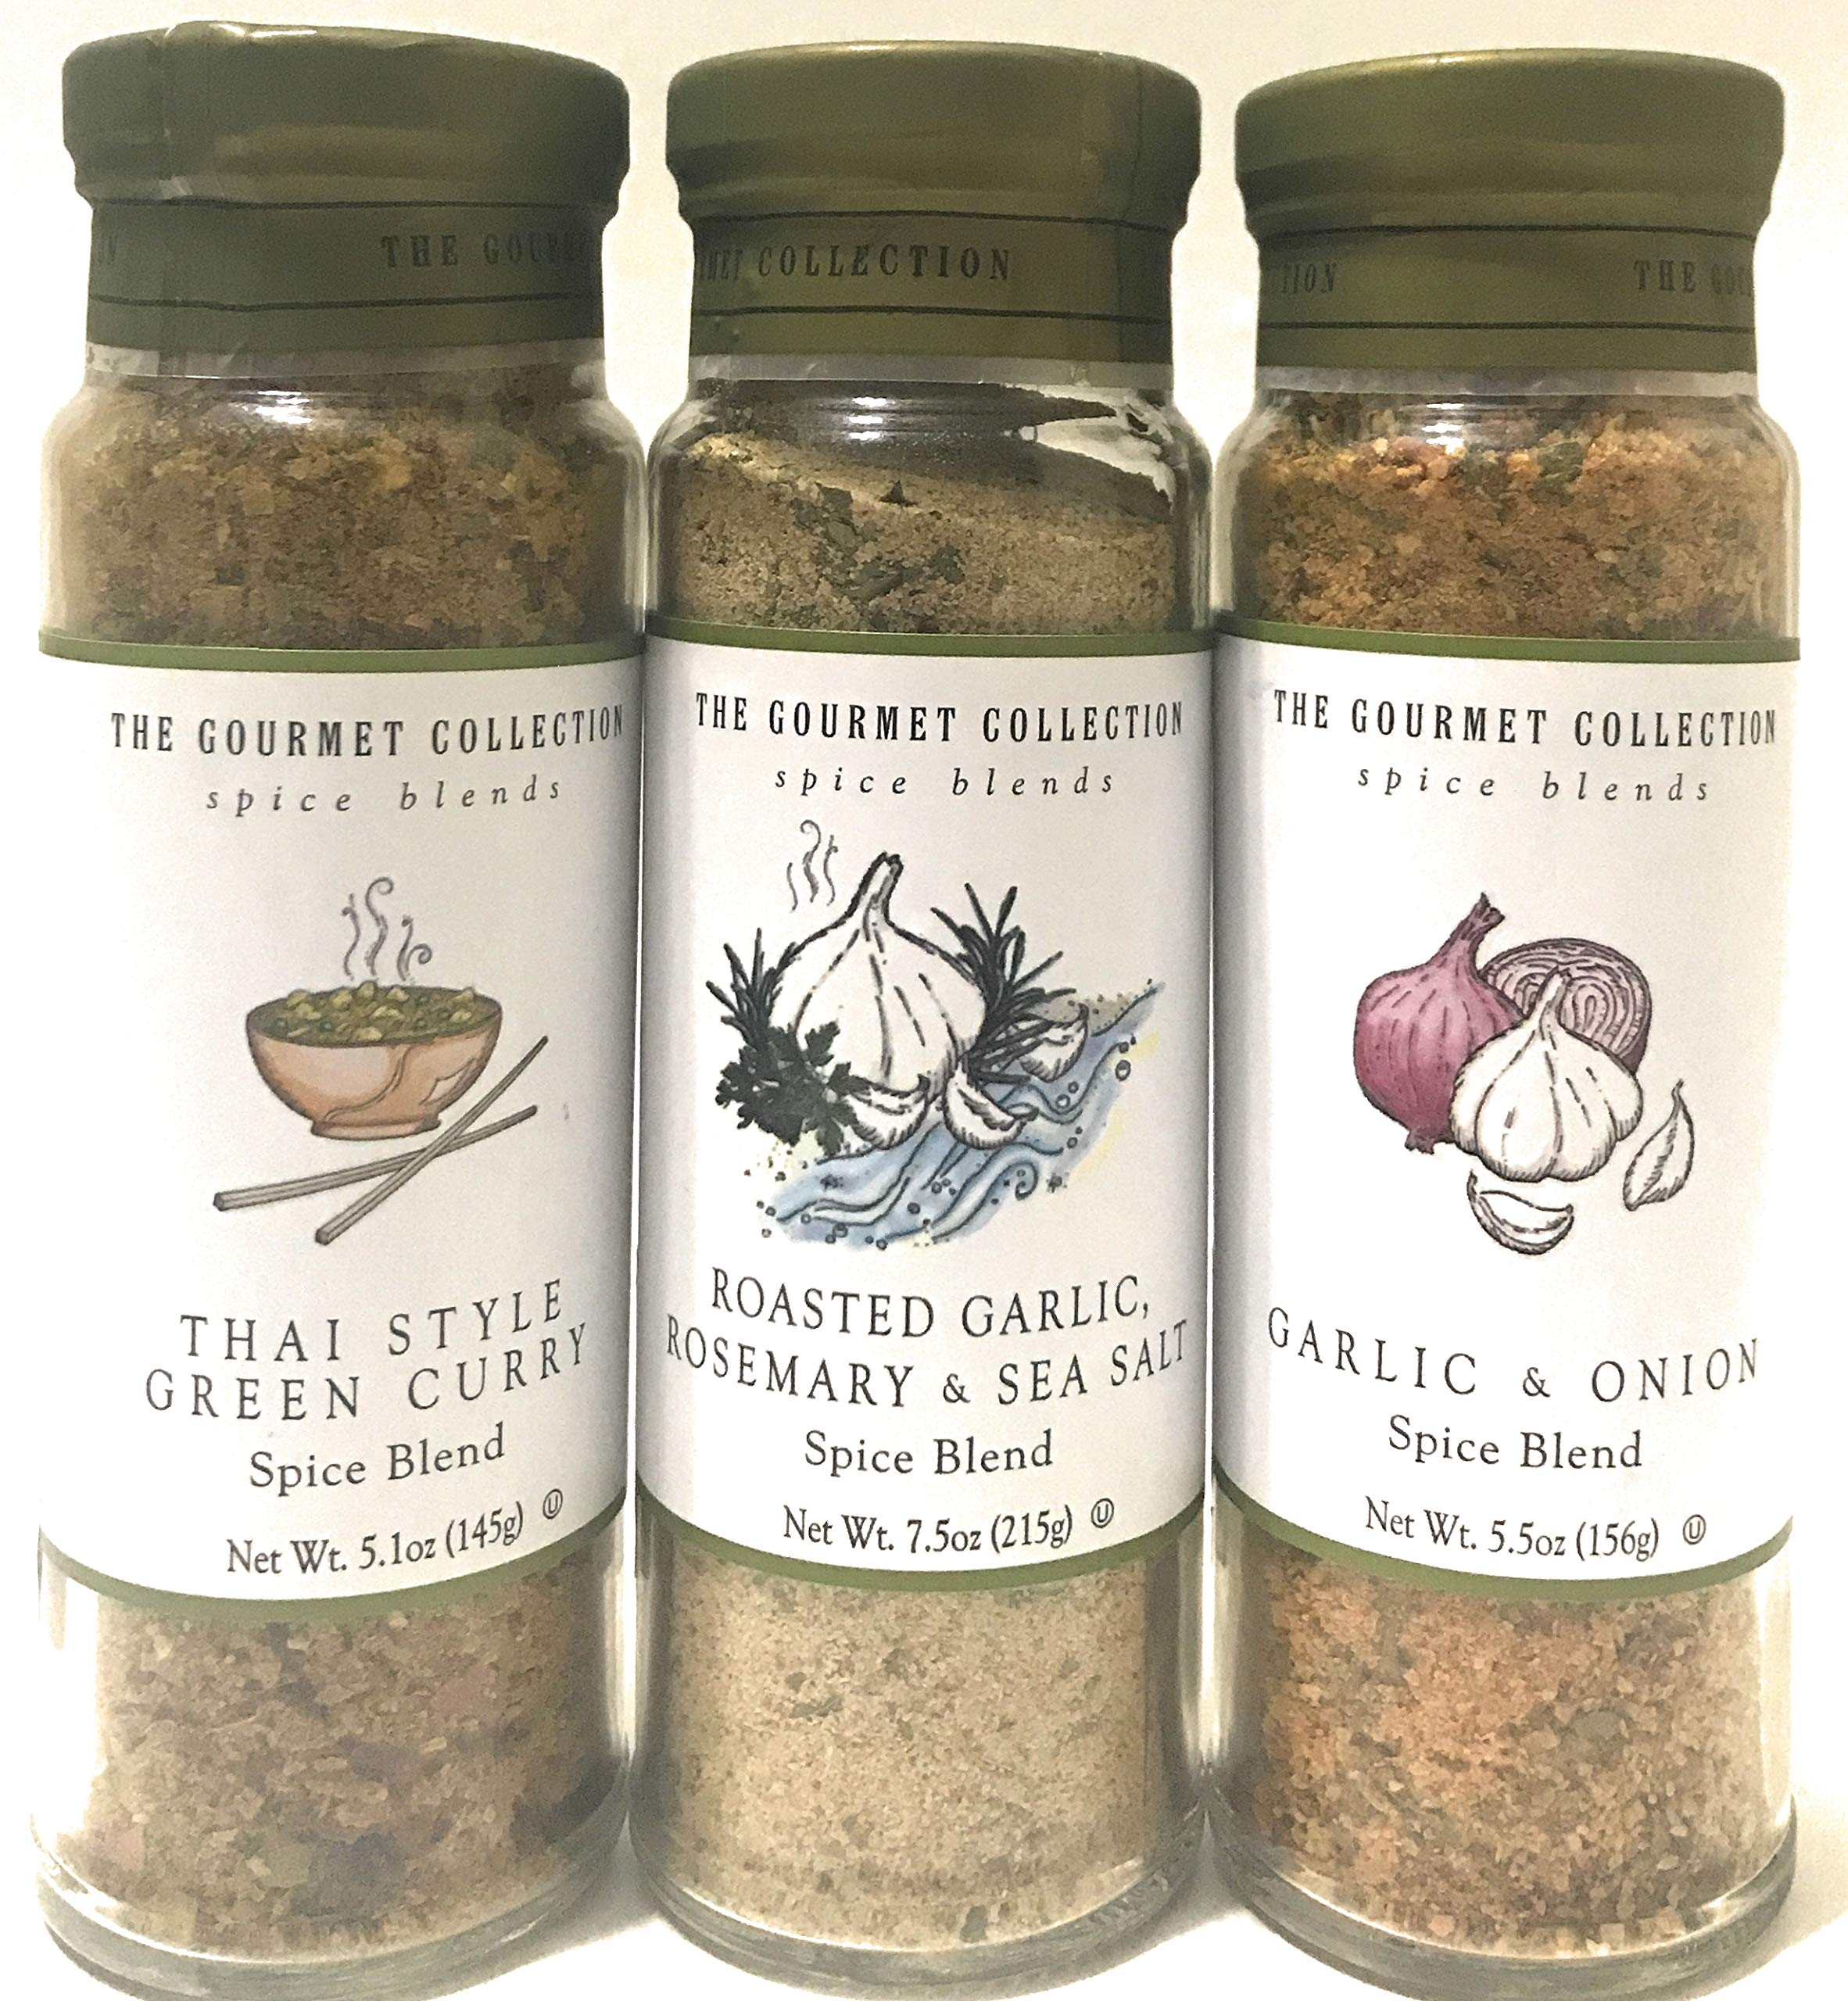 Thai Style Green Curry; Garlic and Onion Spice Blend; Roasted Garlic, Rosemary, Sea Salt; Garlic & Onion Spice Blend, 3 Bottle Set